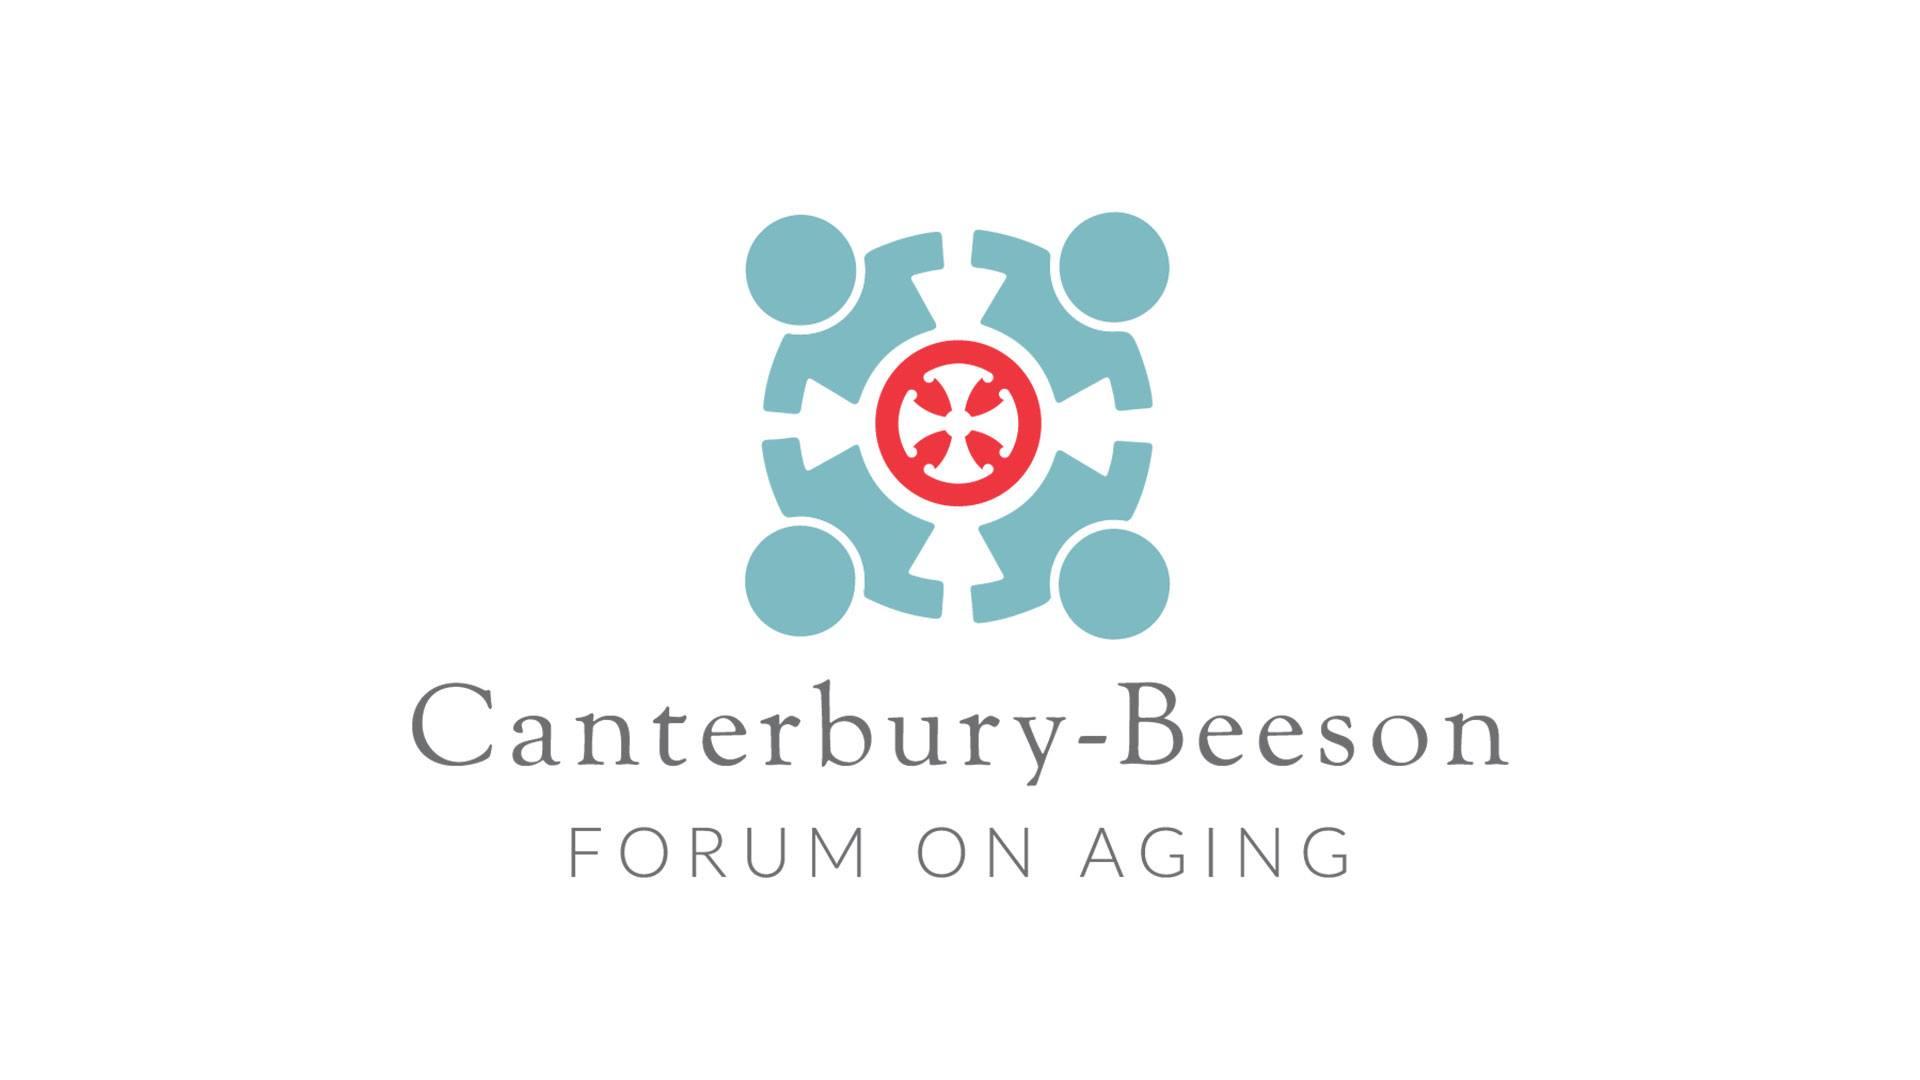 canterbury-beeson-logo.jpg